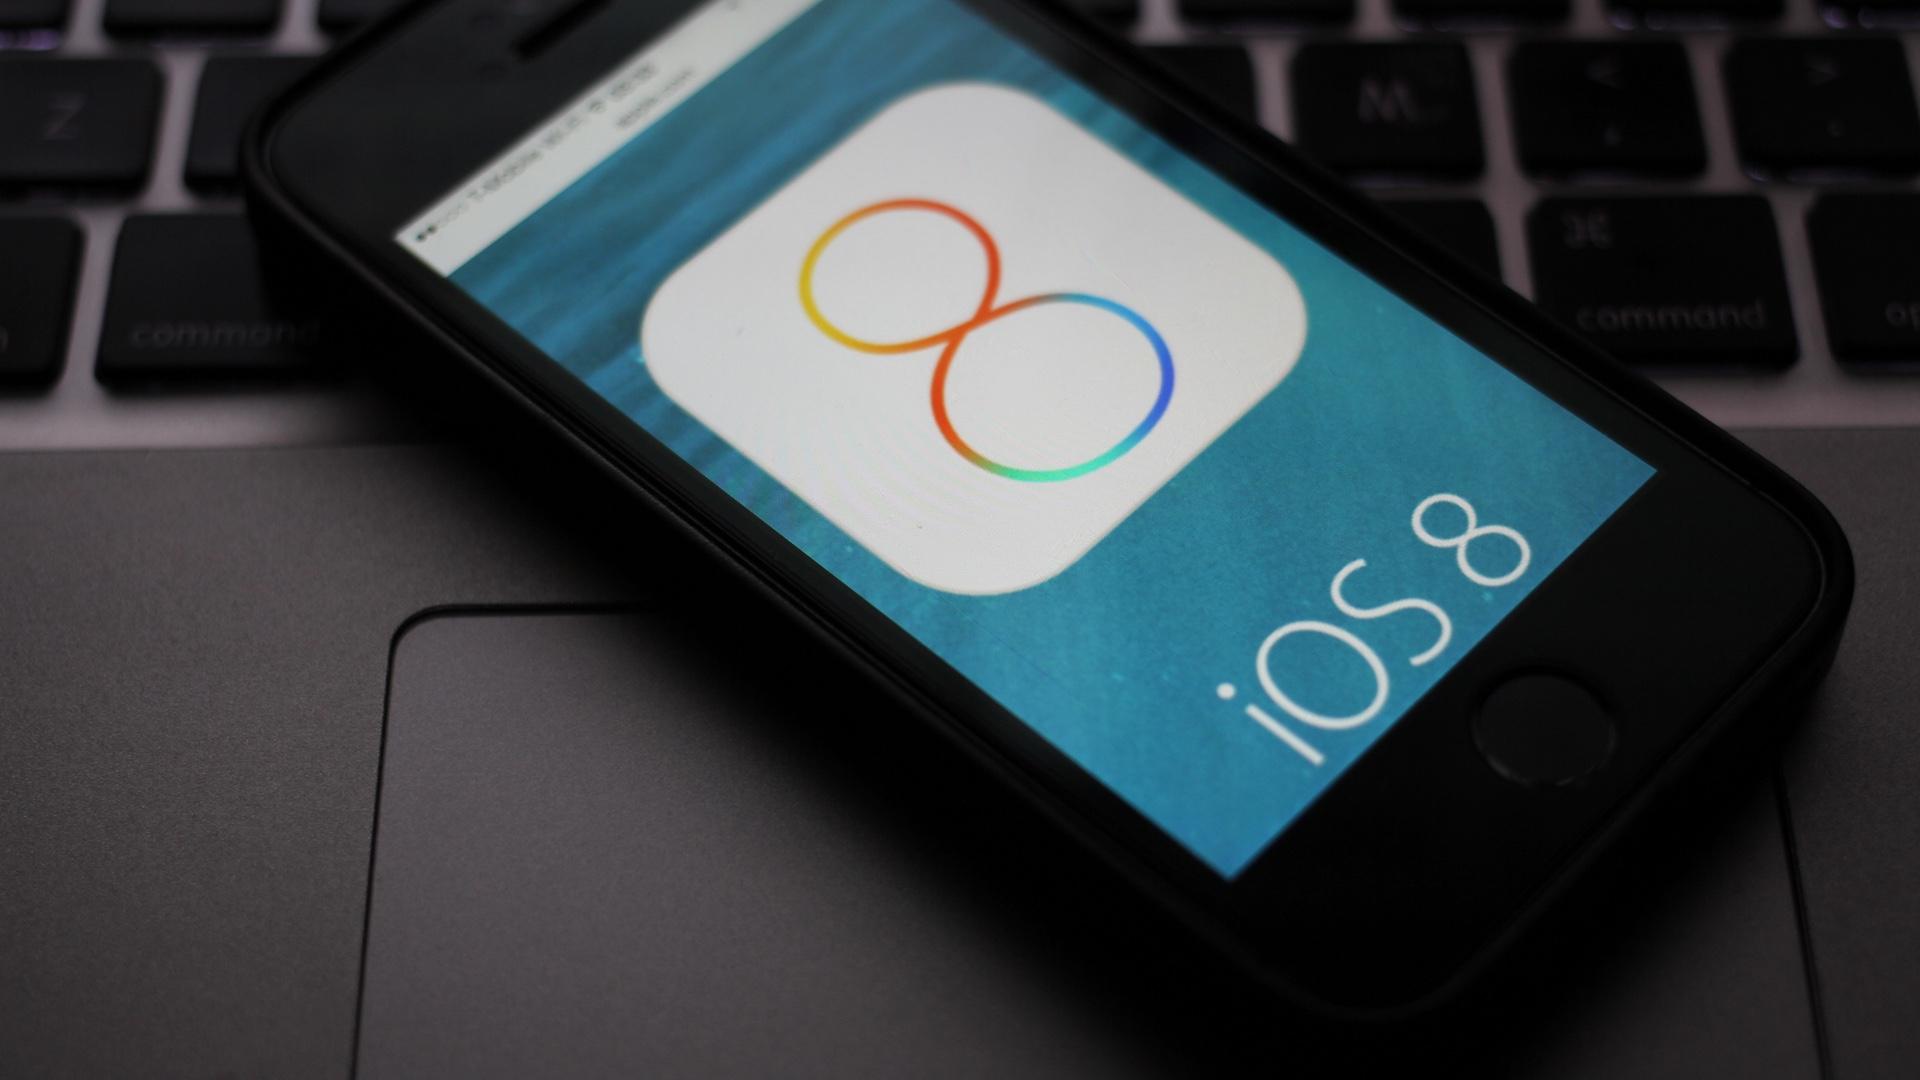 iOS 8 on iPhone 5s